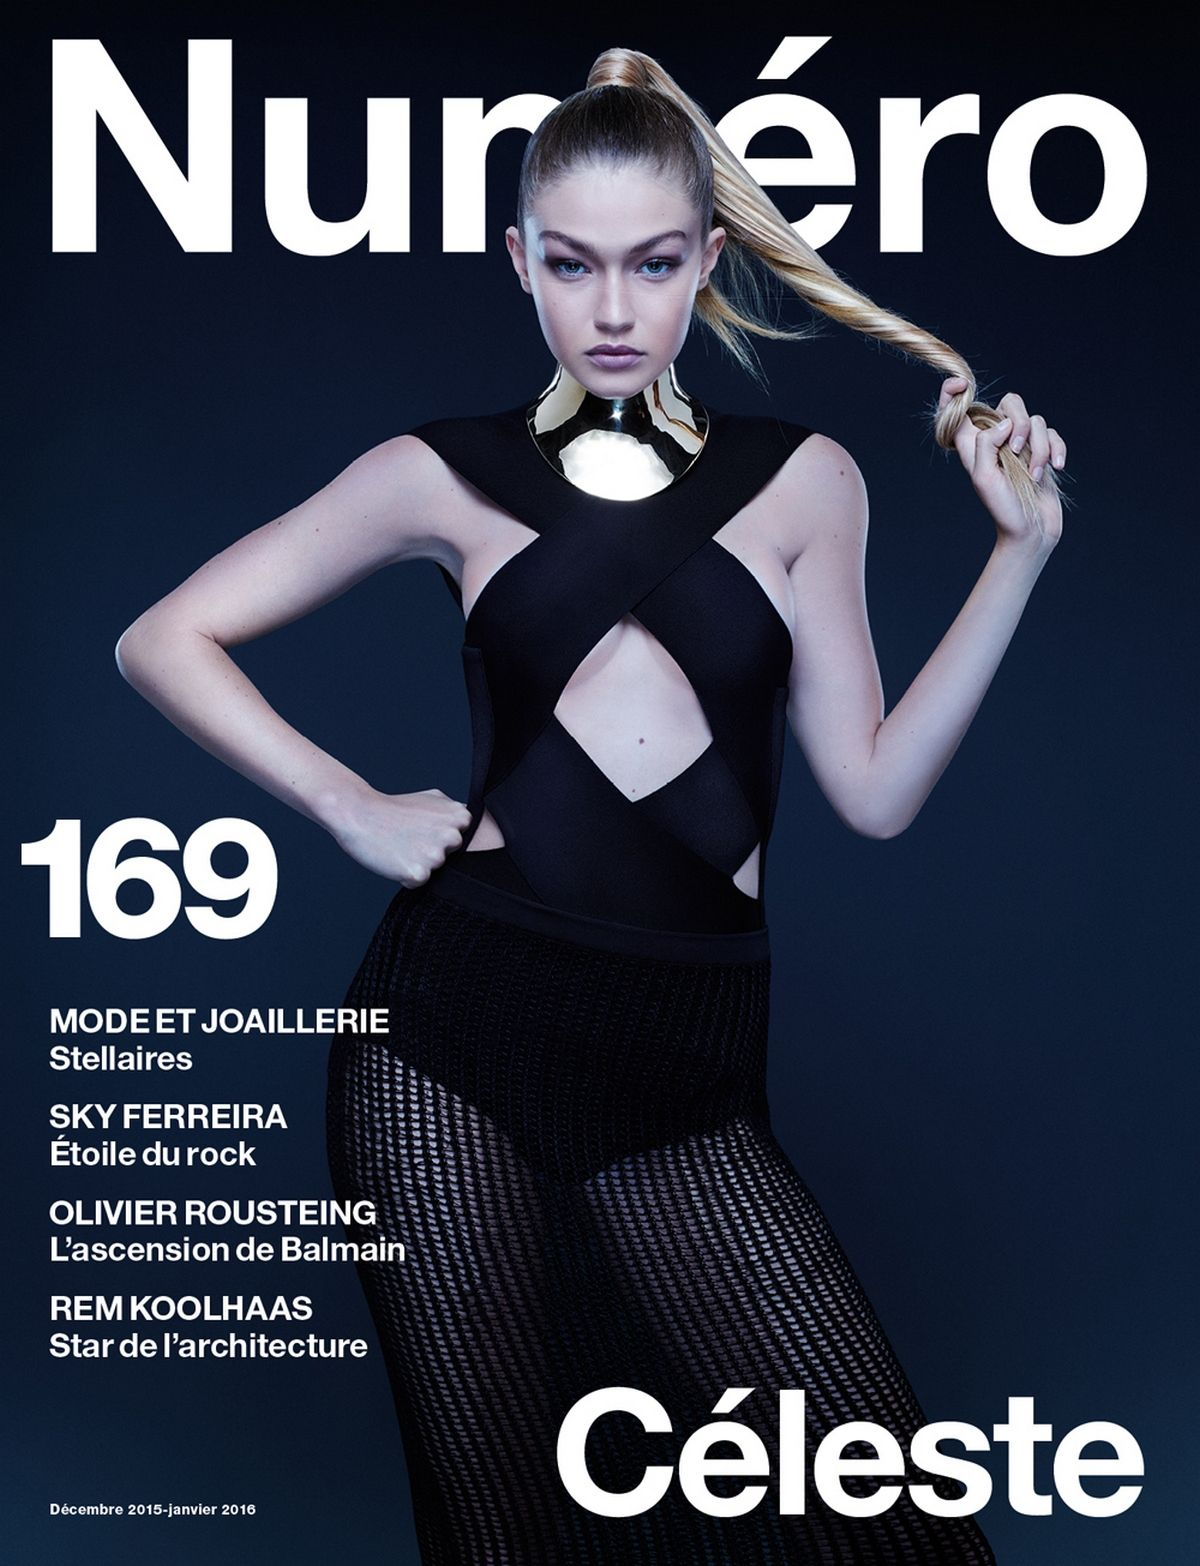 HIHI HADID in Numero Magazine, France December 2015/January 2016 Issue